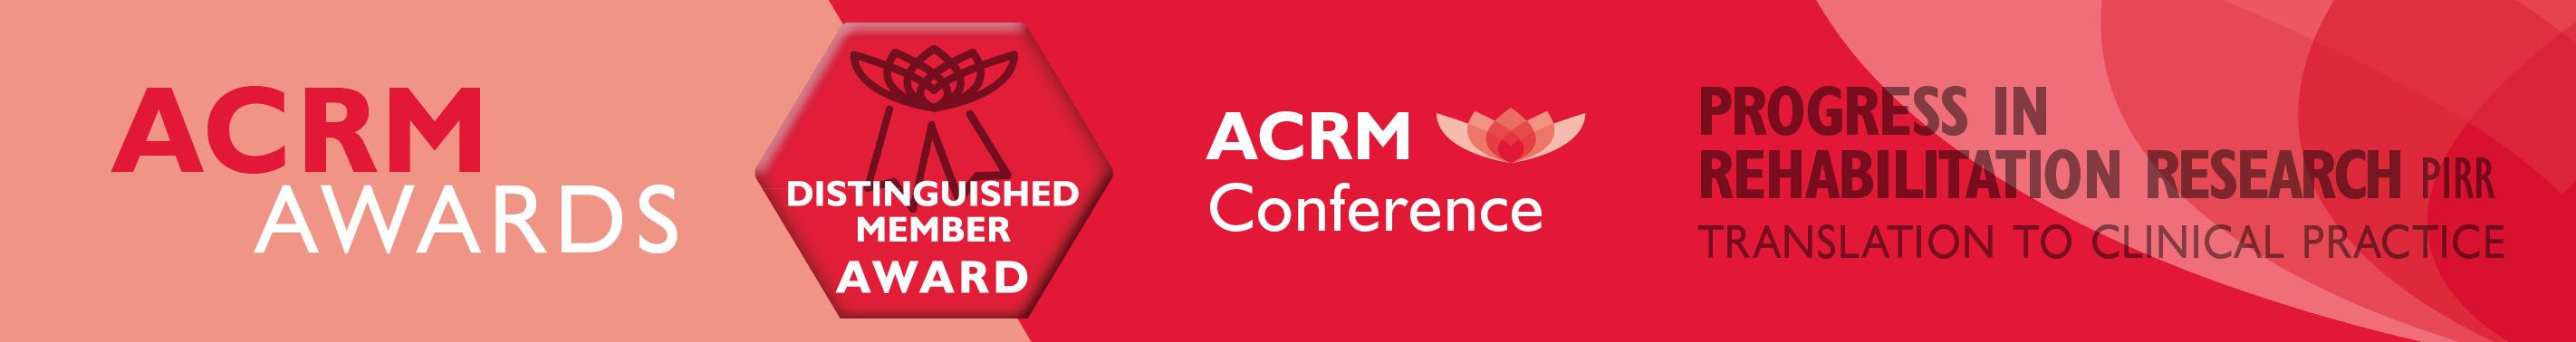 Distinguished Member Award ACRM Award